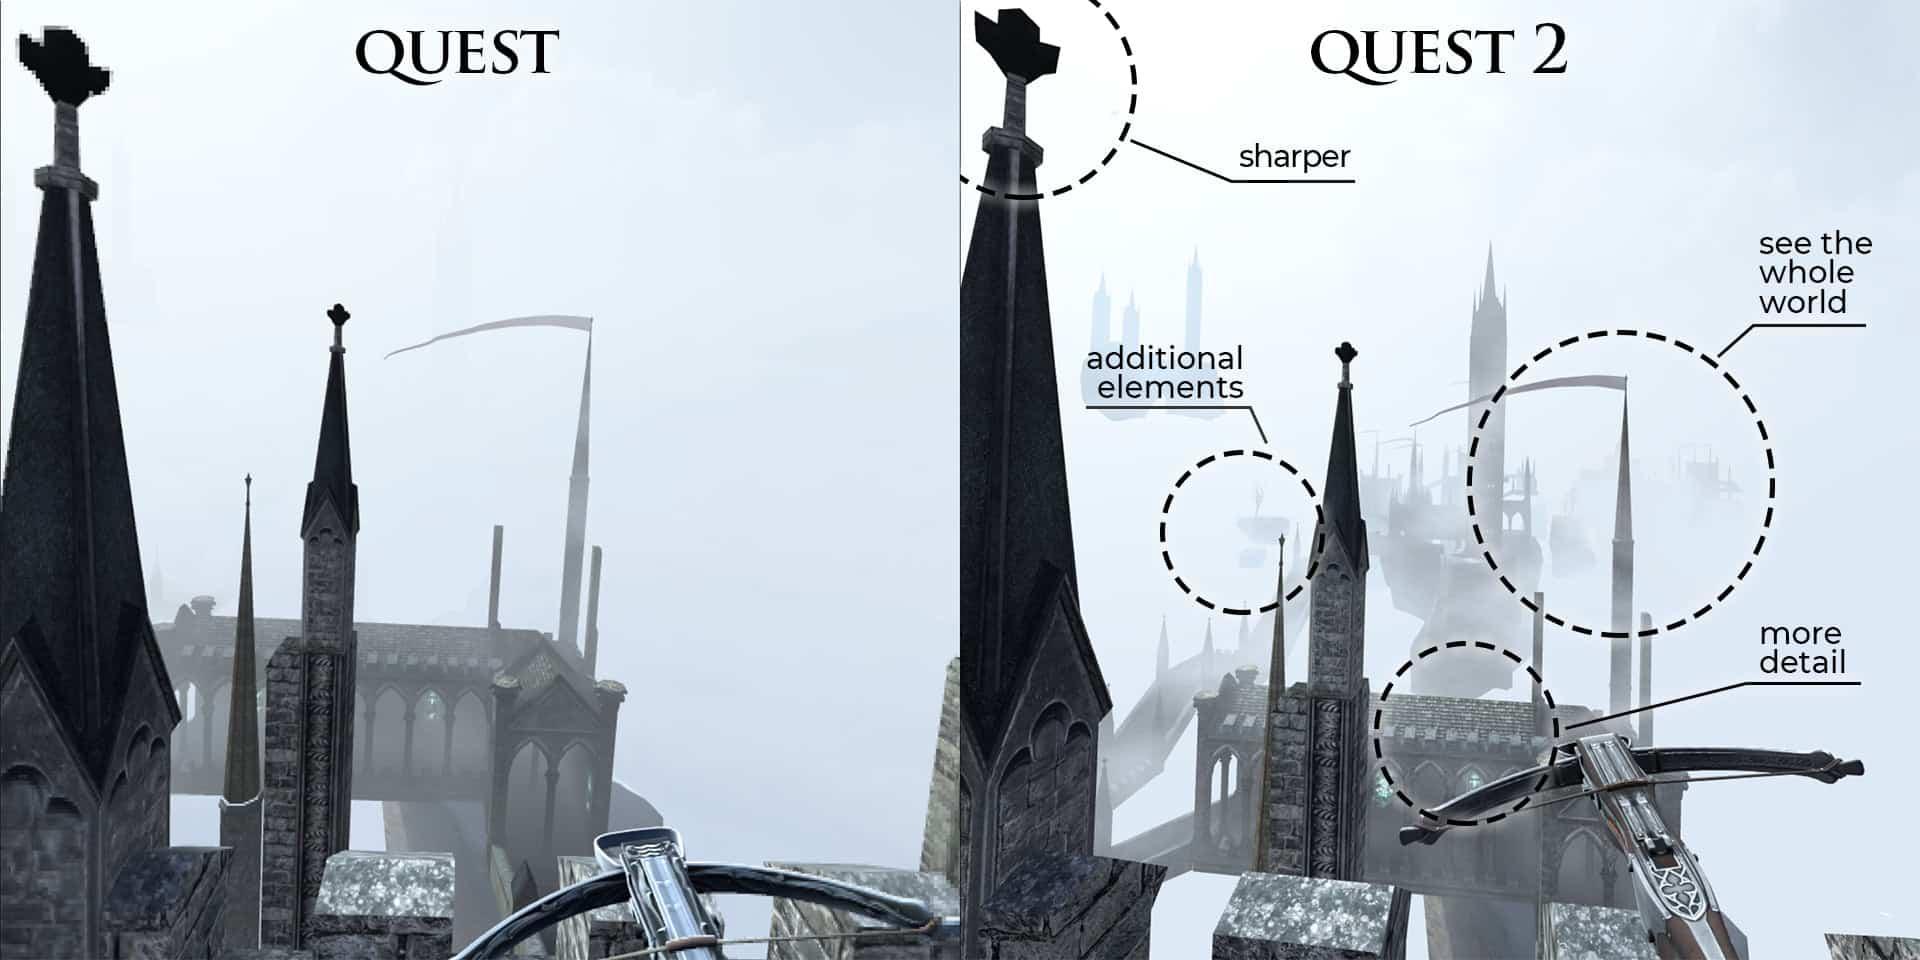 quest 1 vs quest 2